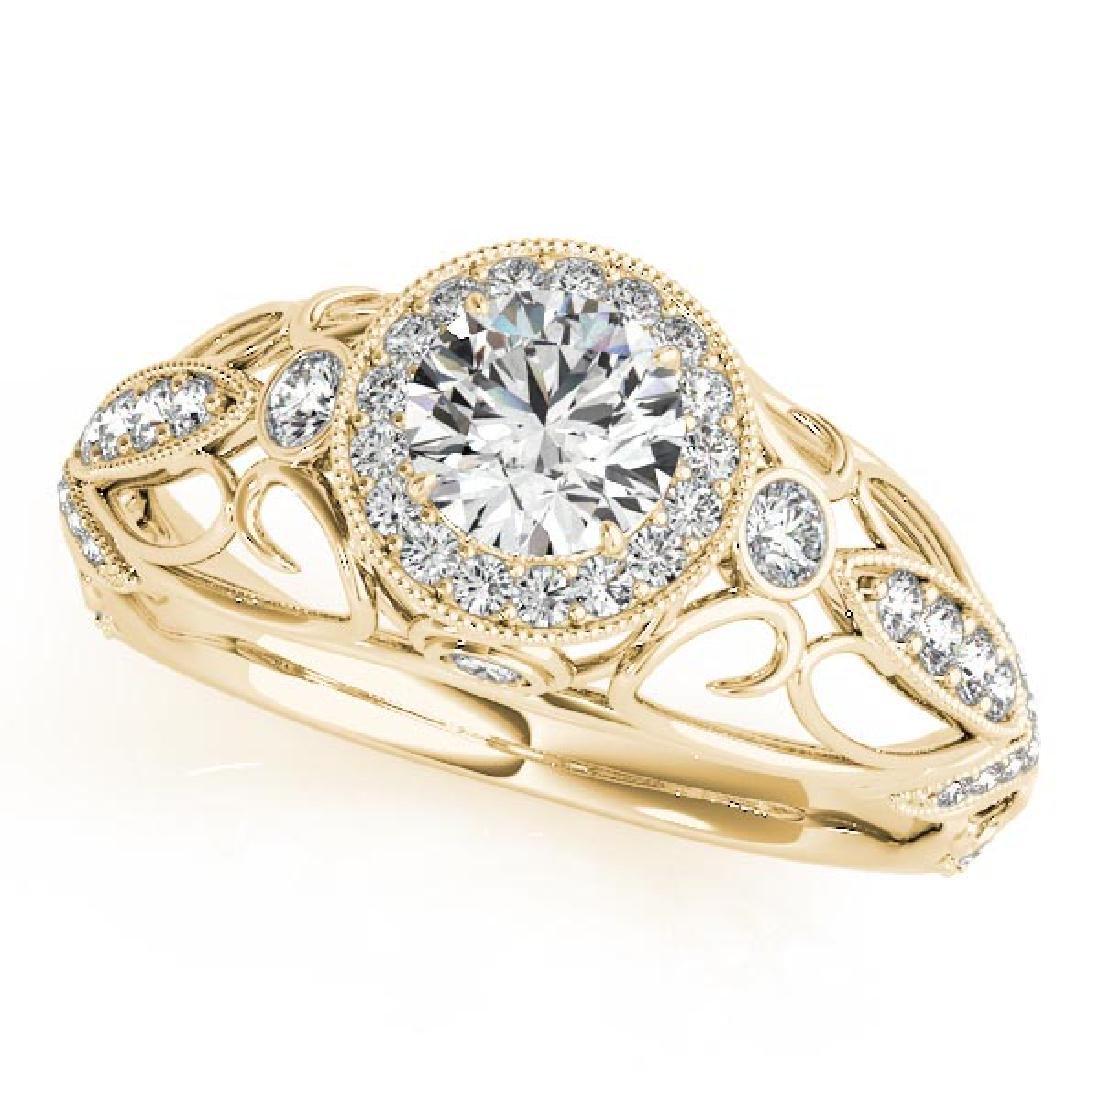 CERTIFIED 18K YELLOW GOLD 1.20 CT G-H/VS-SI1 DIAMOND HA